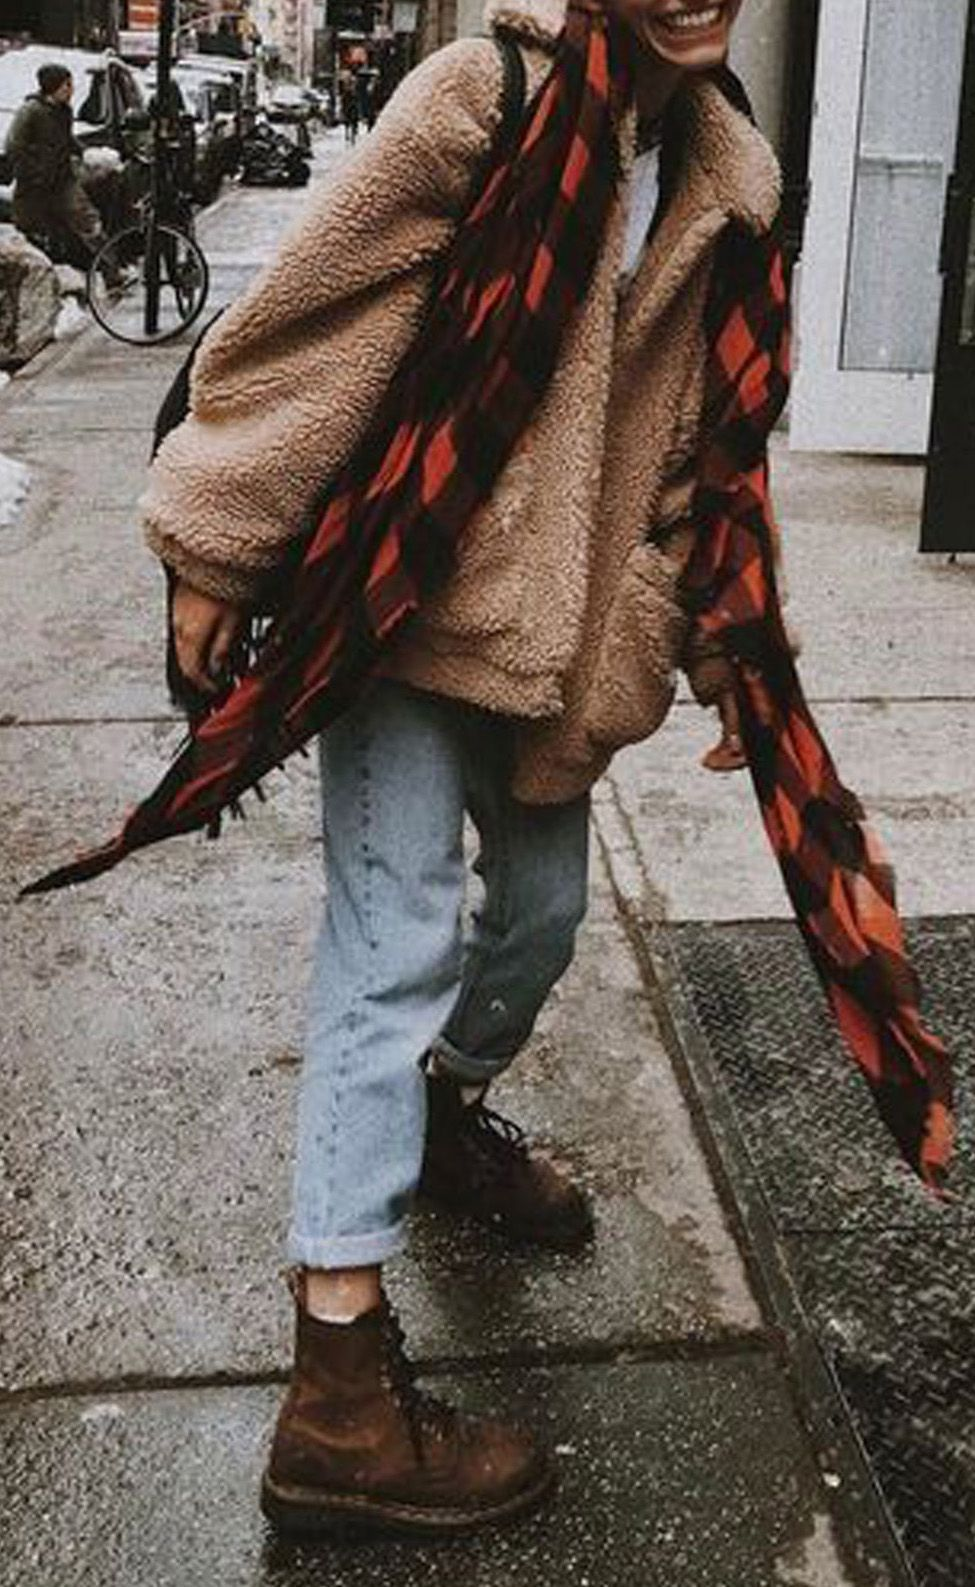 Süße Streetstyle Herbst Outfit Ideen für Frauen #schooloutfit